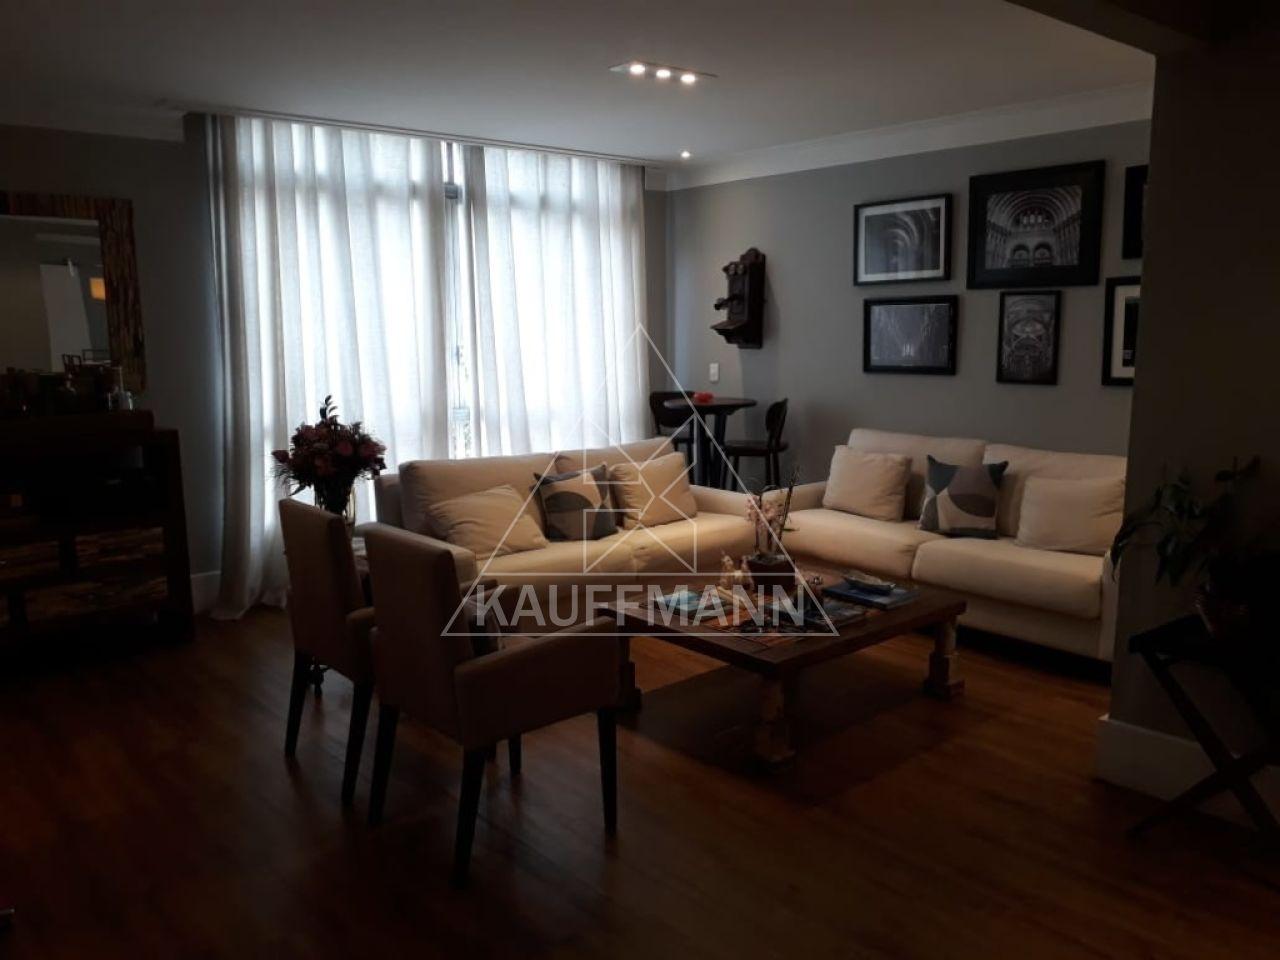 apartamento-venda-sao-paulo-jardim-paulista-3dormitorios-3suites-1vaga-174m2-Foto7